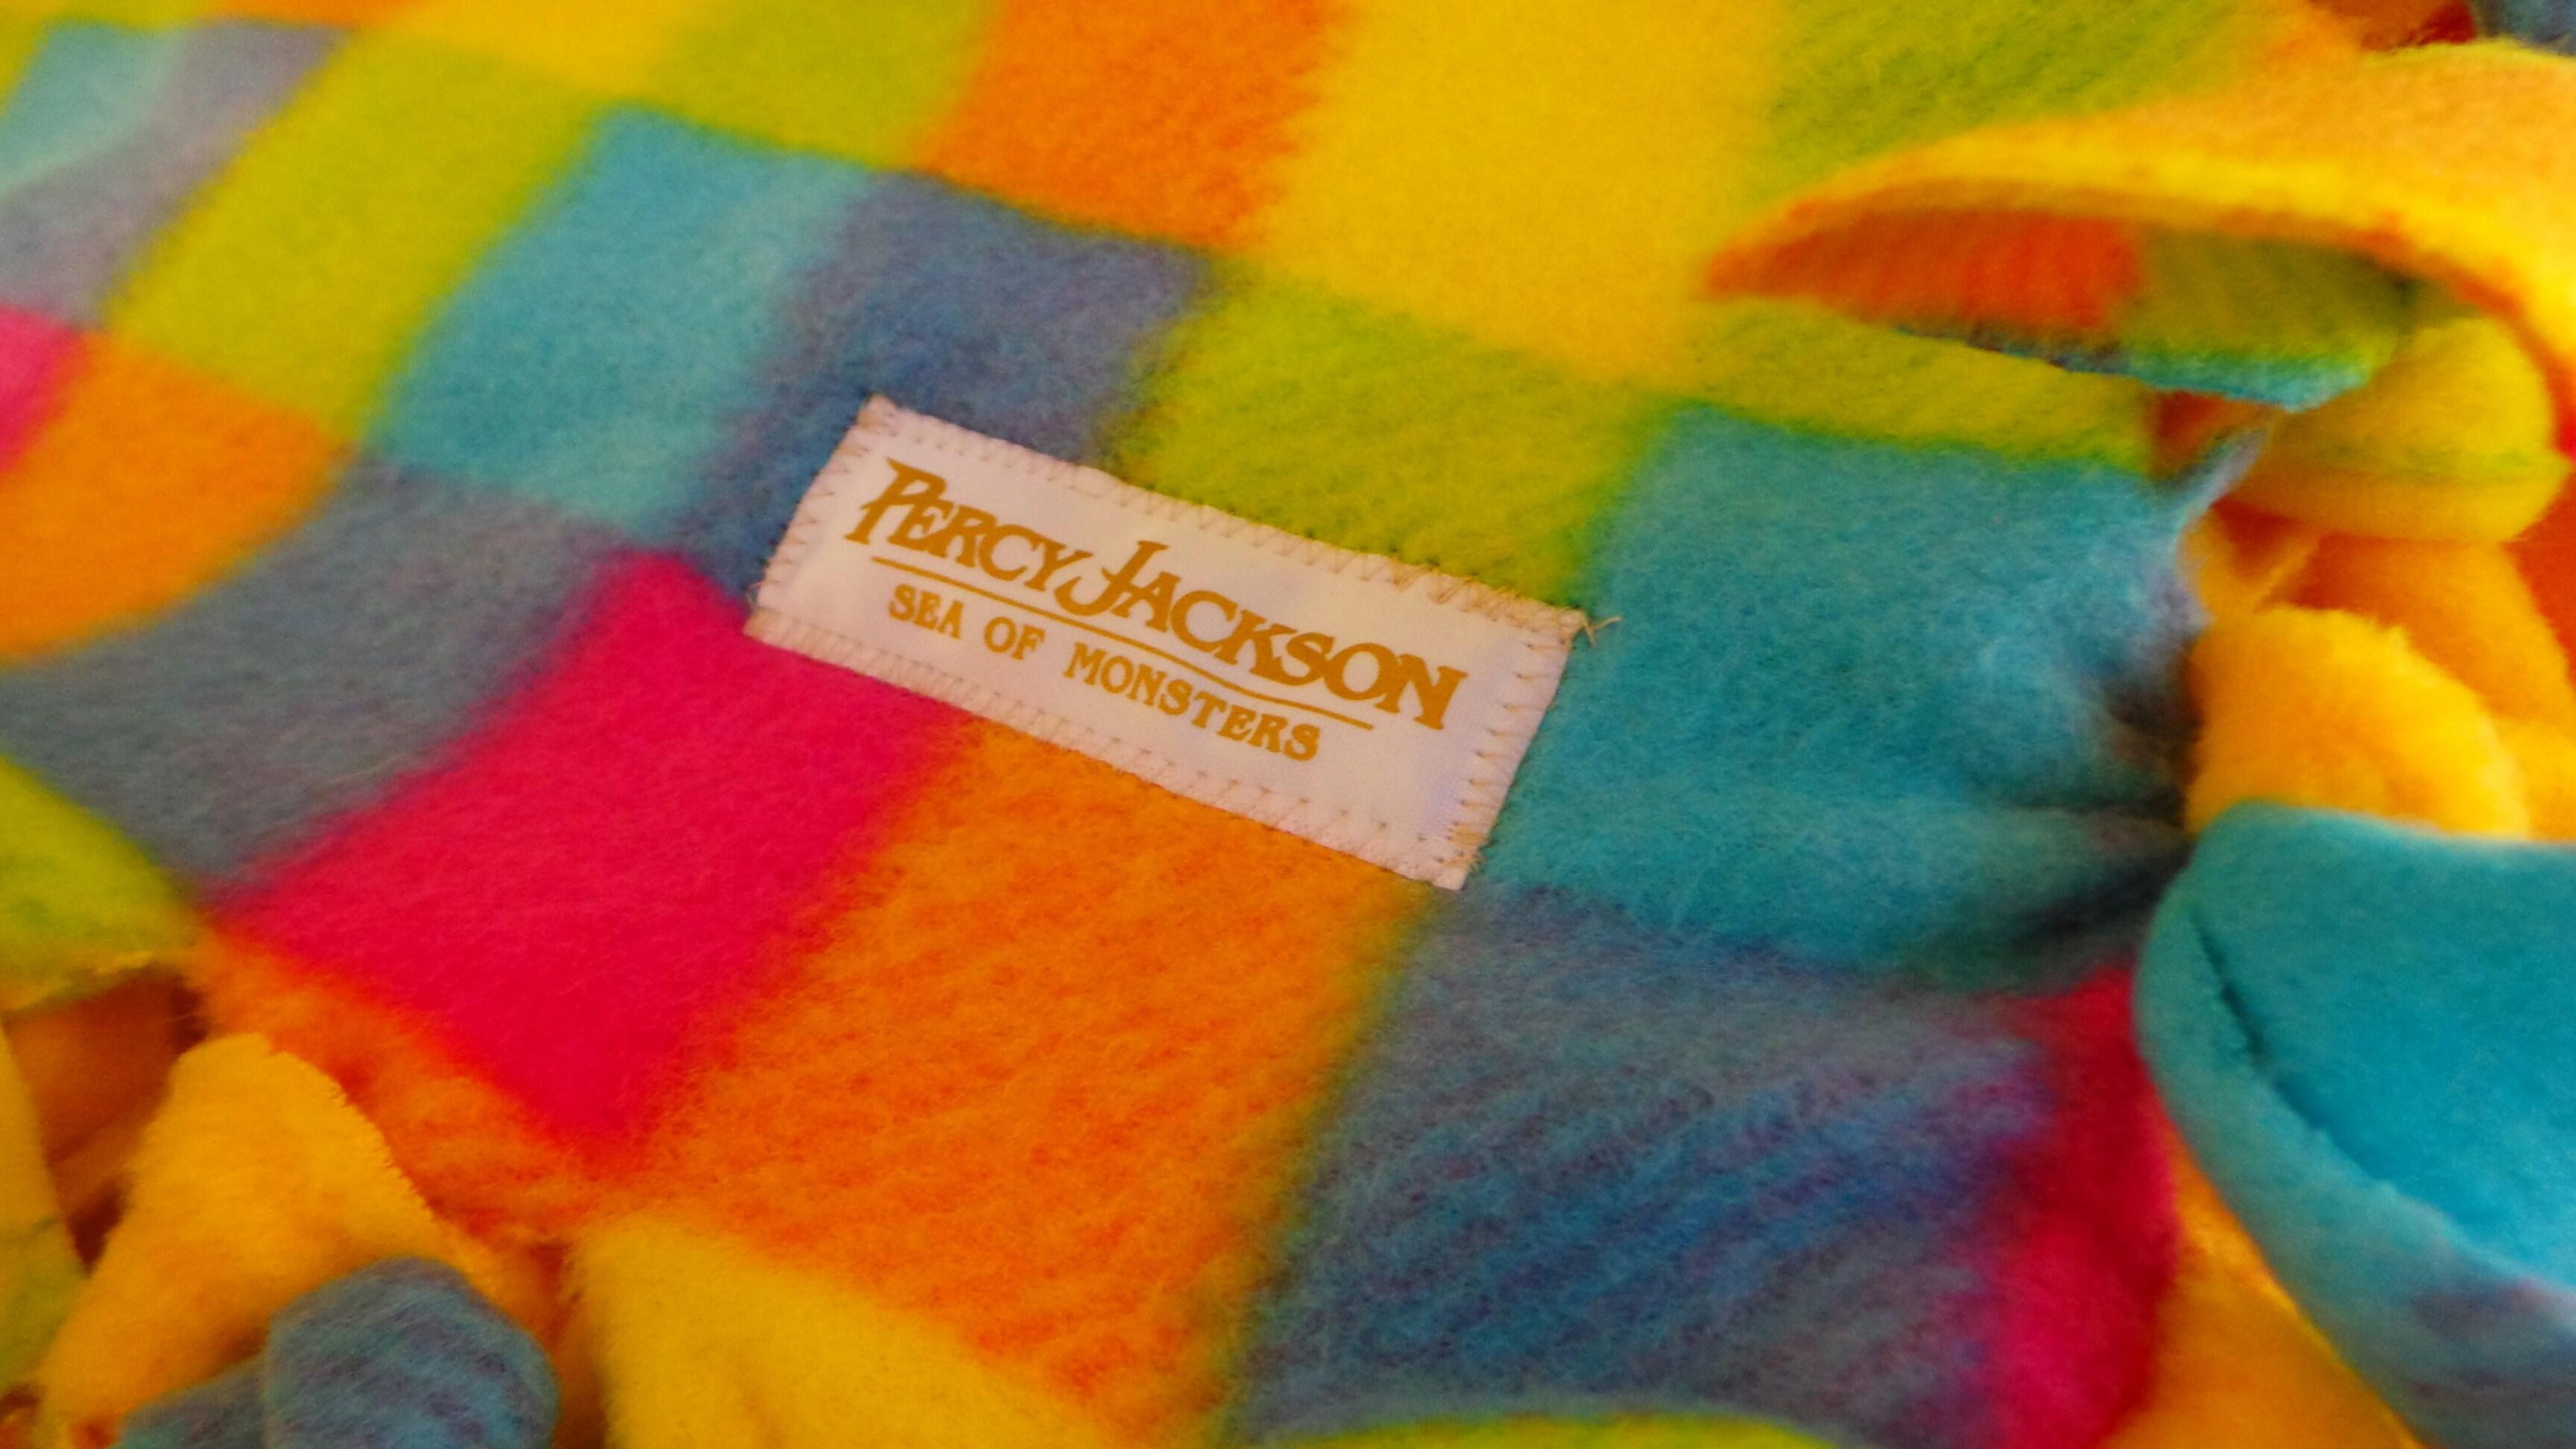 Percy-Jackson-02